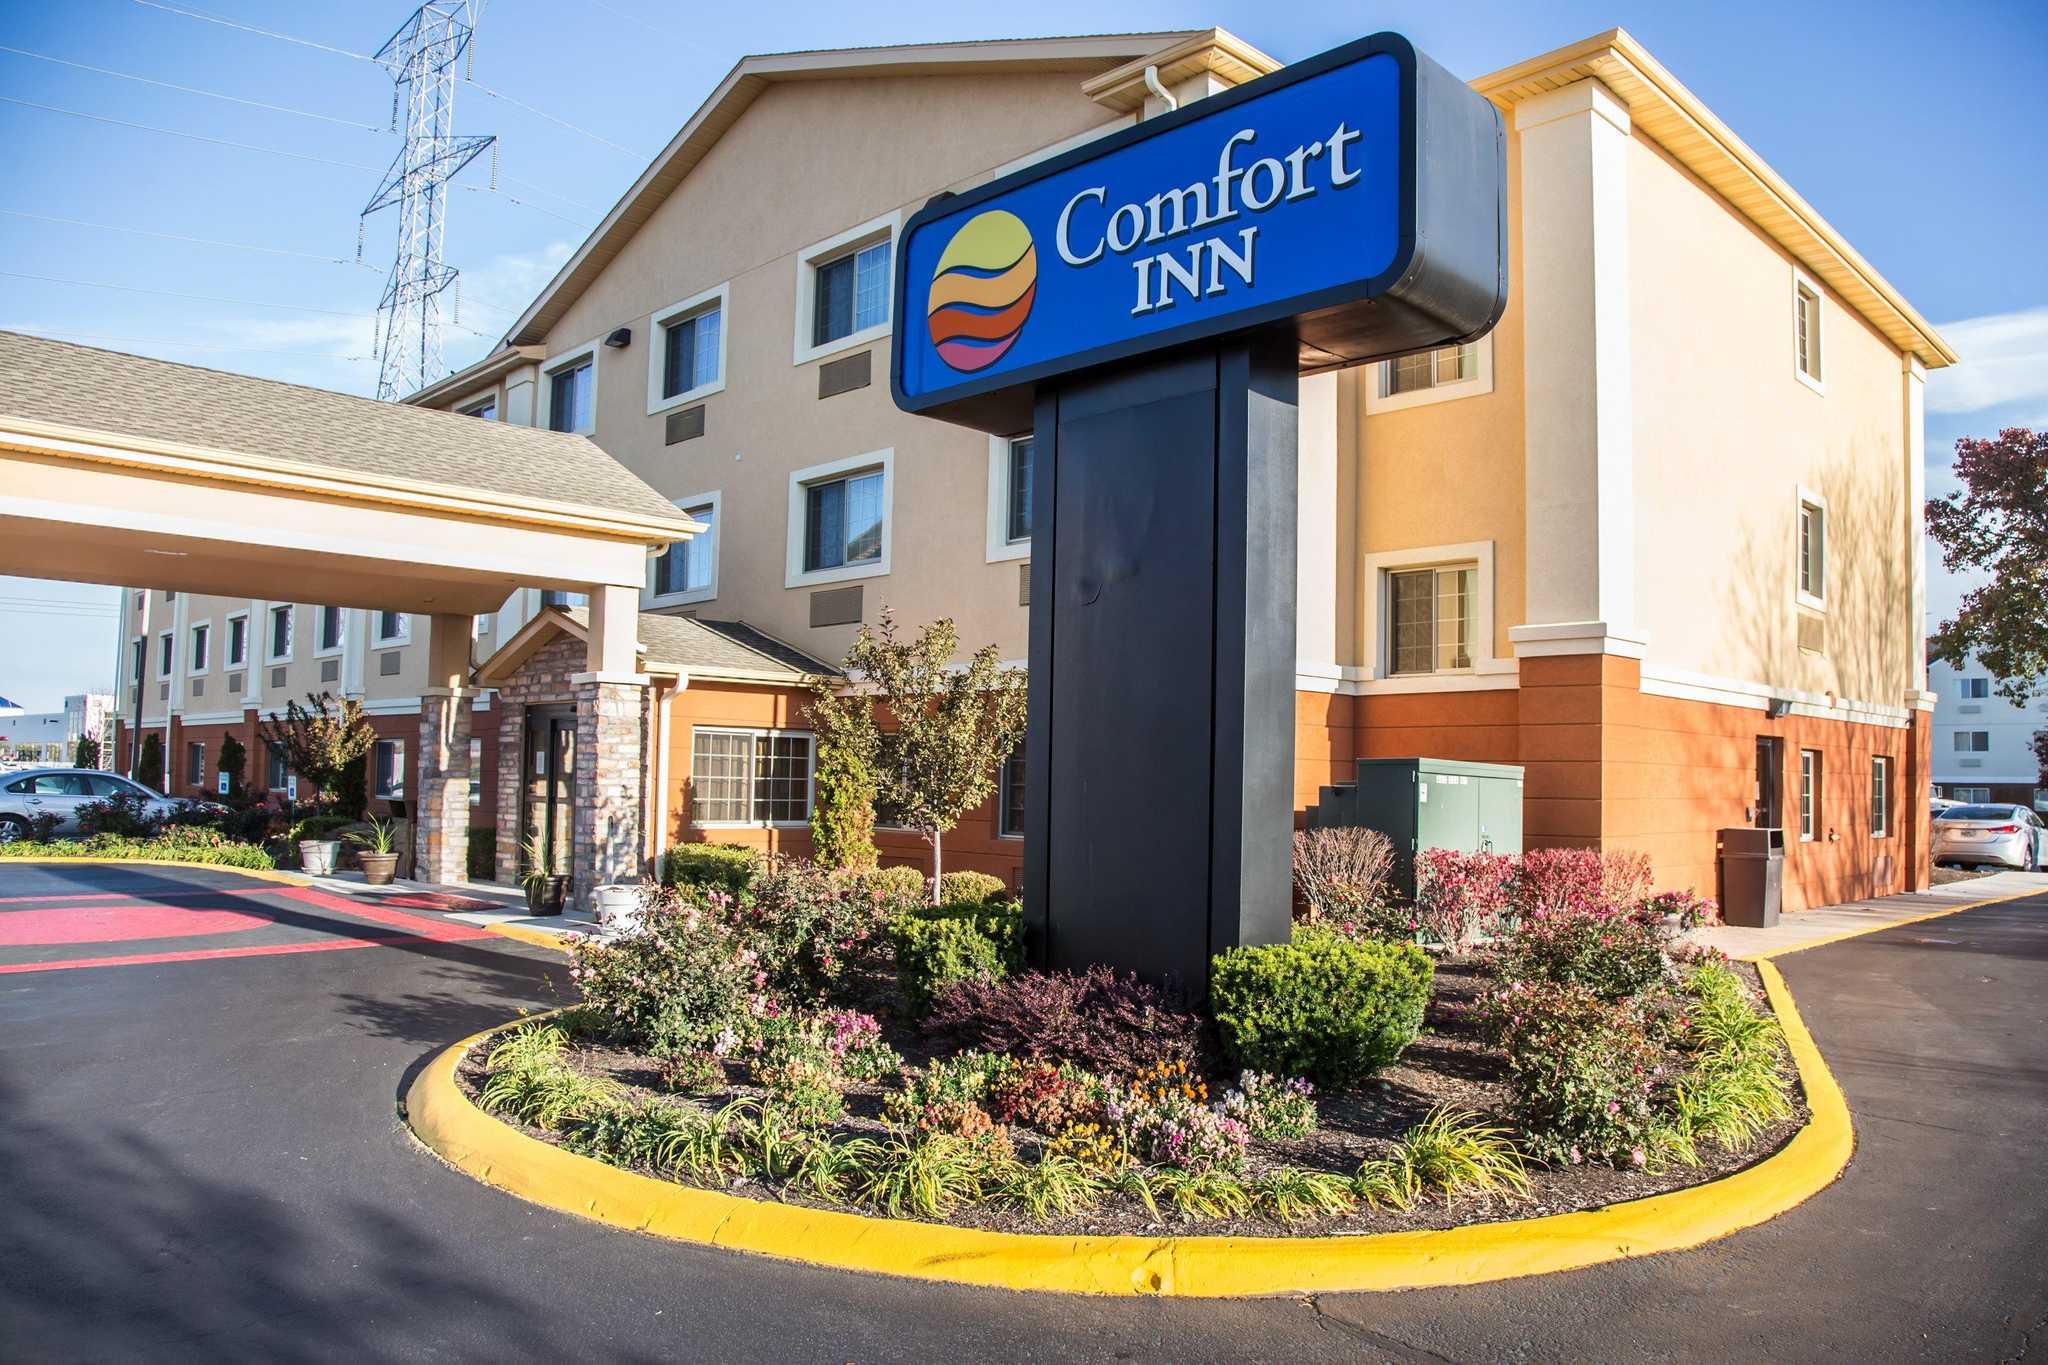 Comfort Inn North image 15